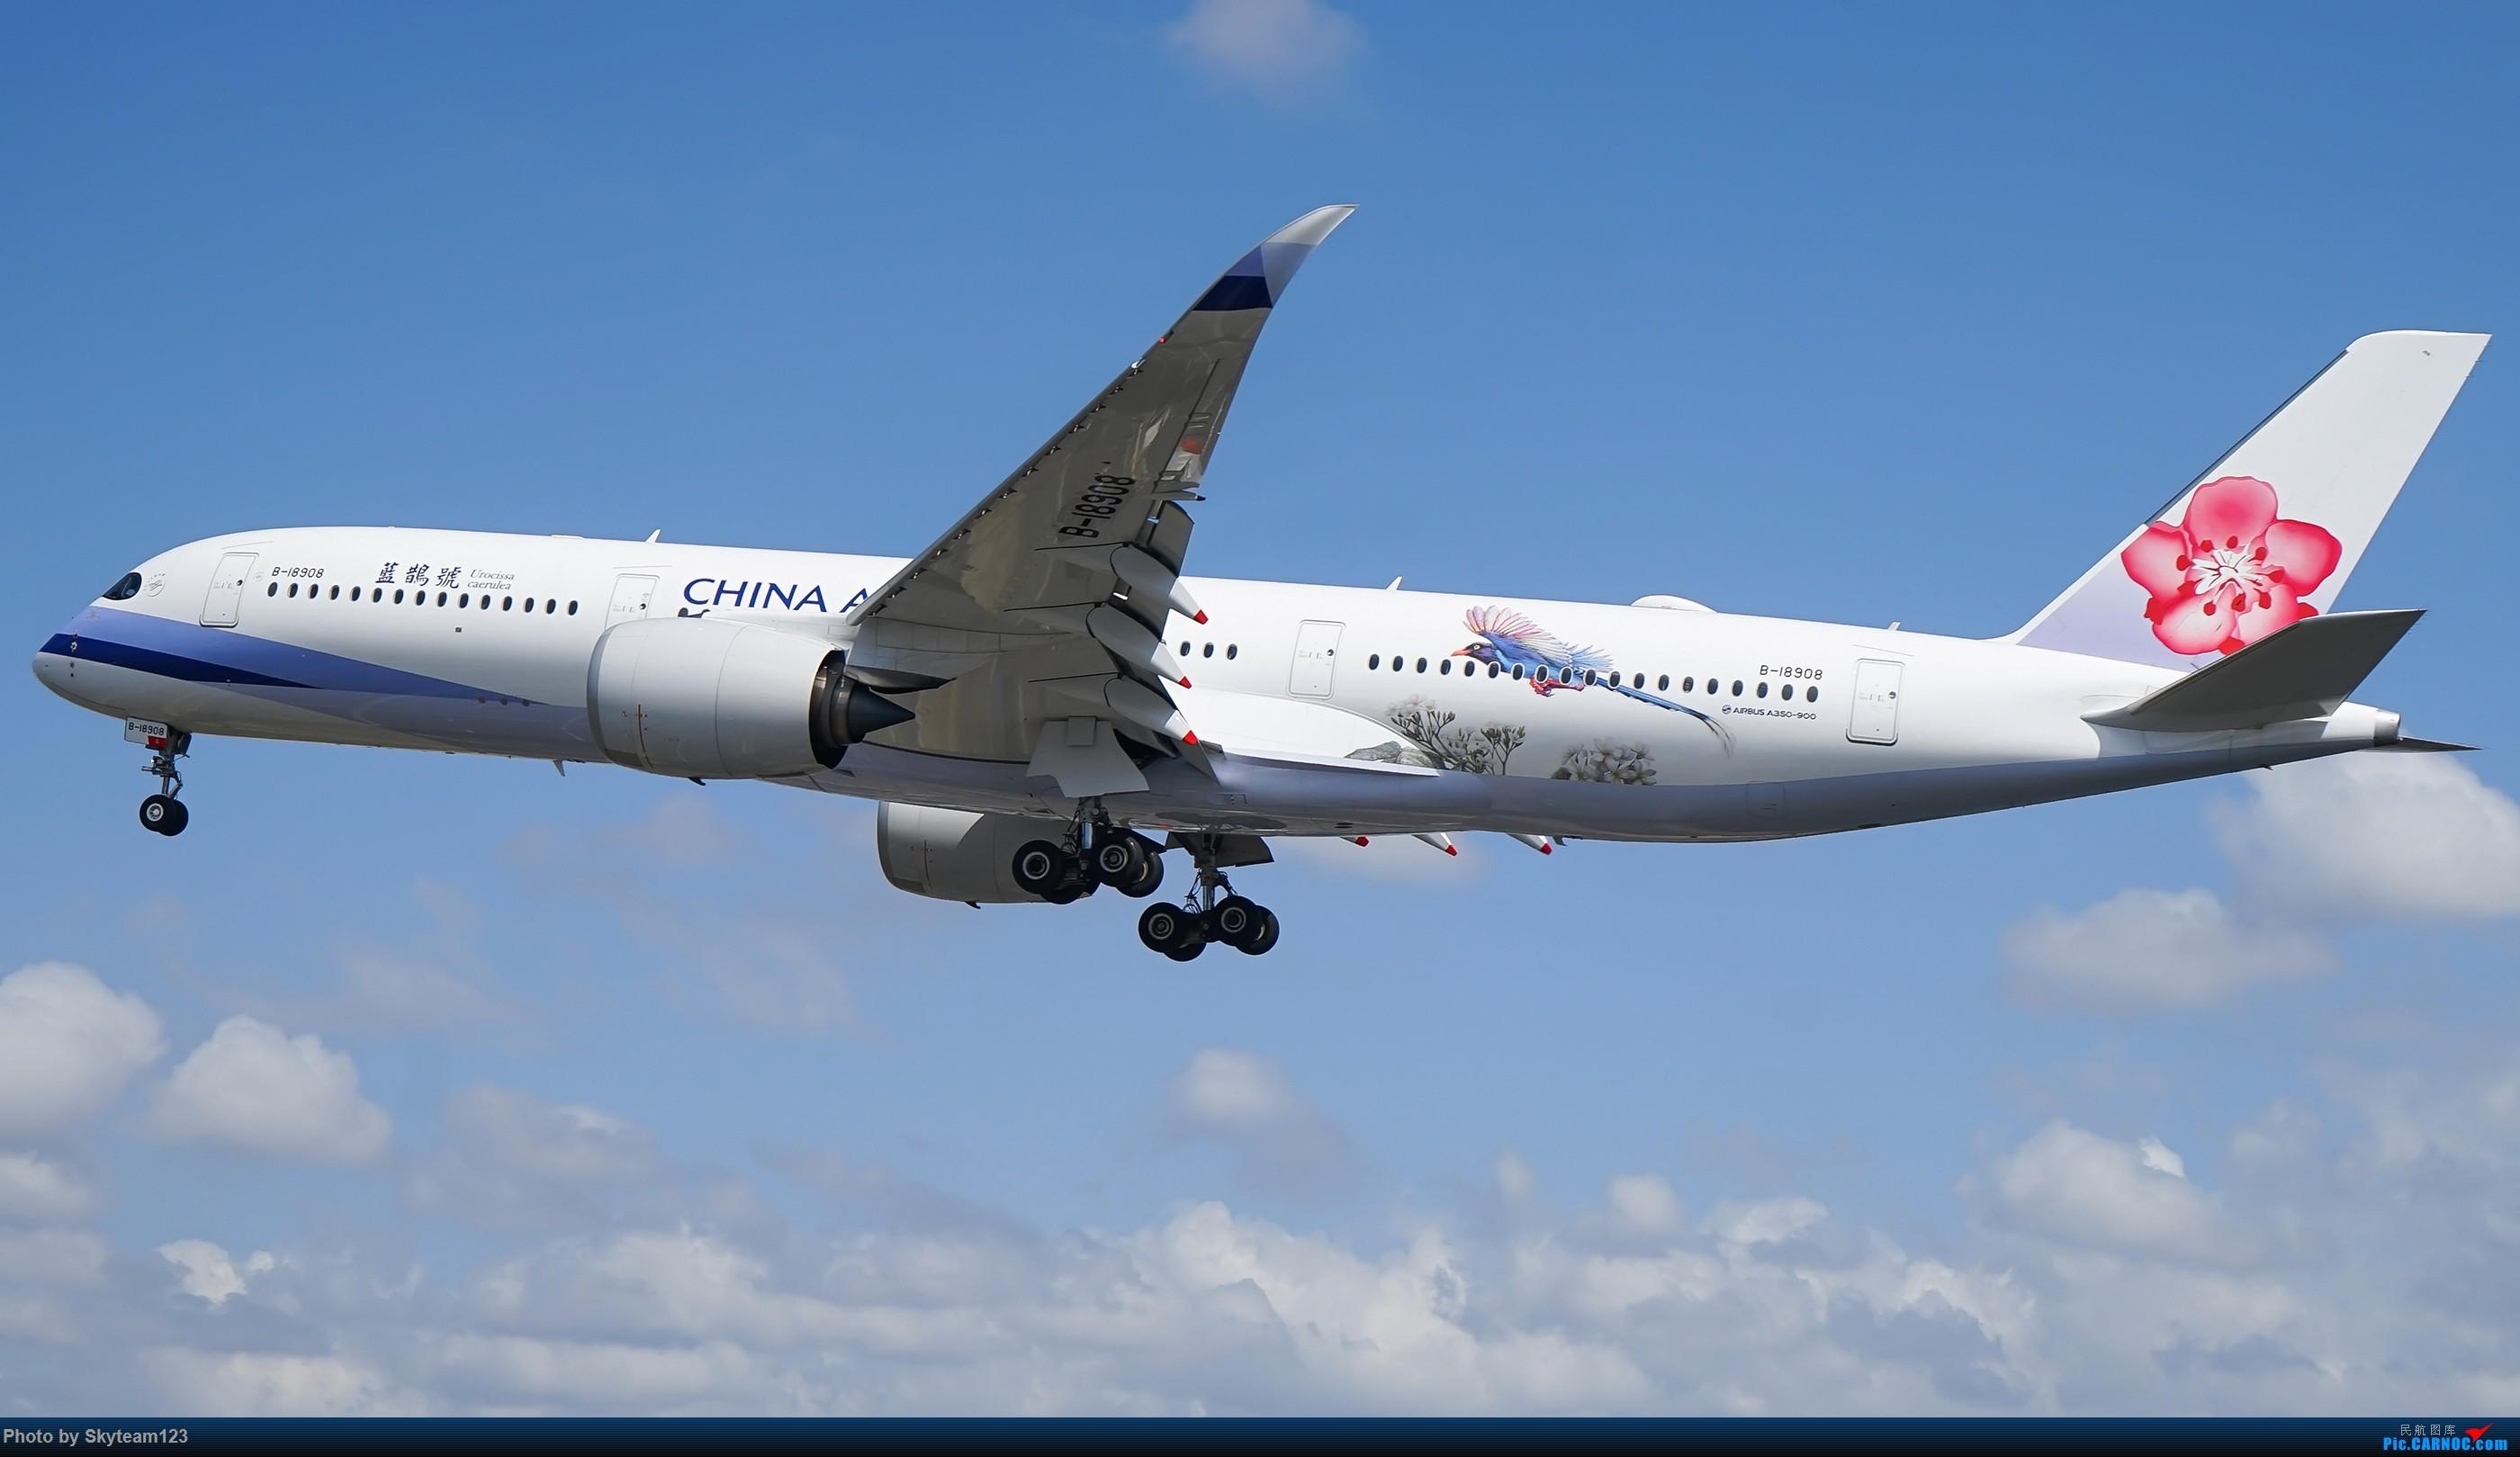 Re:[原创][SYD] 假期拍机小结 解锁16R跑道头拍机位 & 停车楼拍机作业 【全宽体】 AIRBUS A350-900 B-18908 澳大利亚悉尼金斯福德·史密斯机场